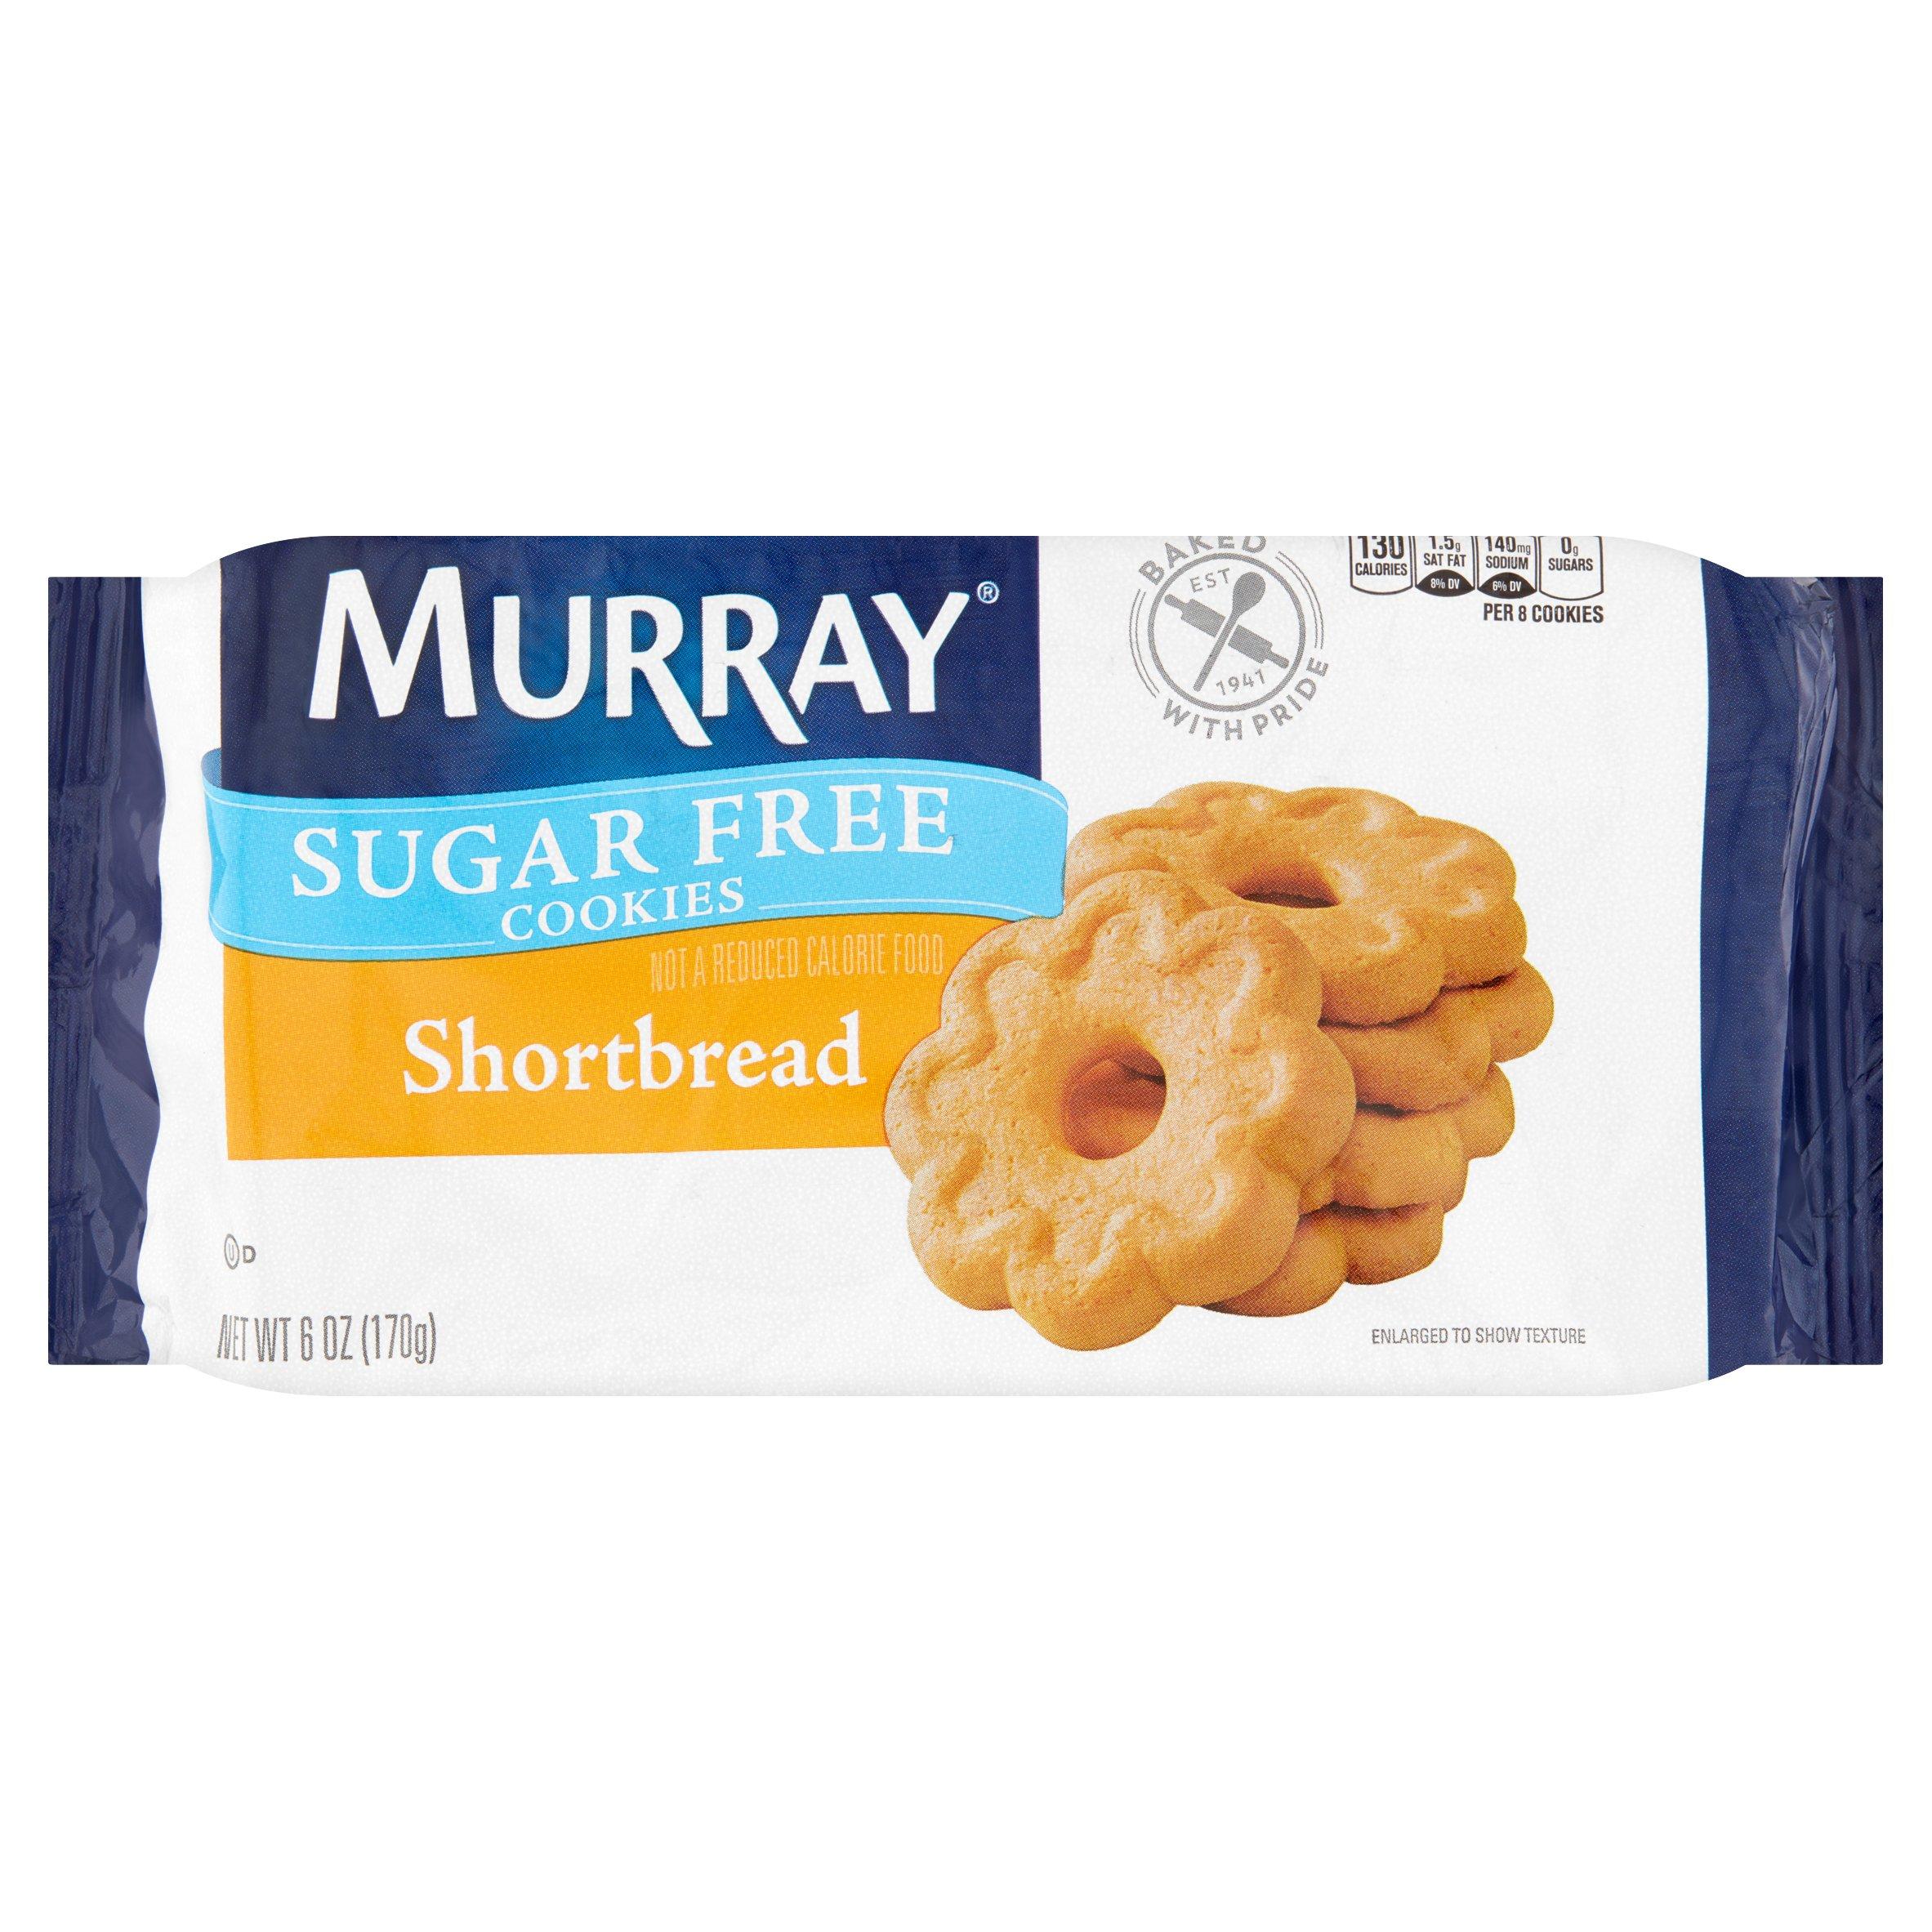 Murray Biscuit Company Generic Murray Sugar Free Shortbread Cookies With Splenda